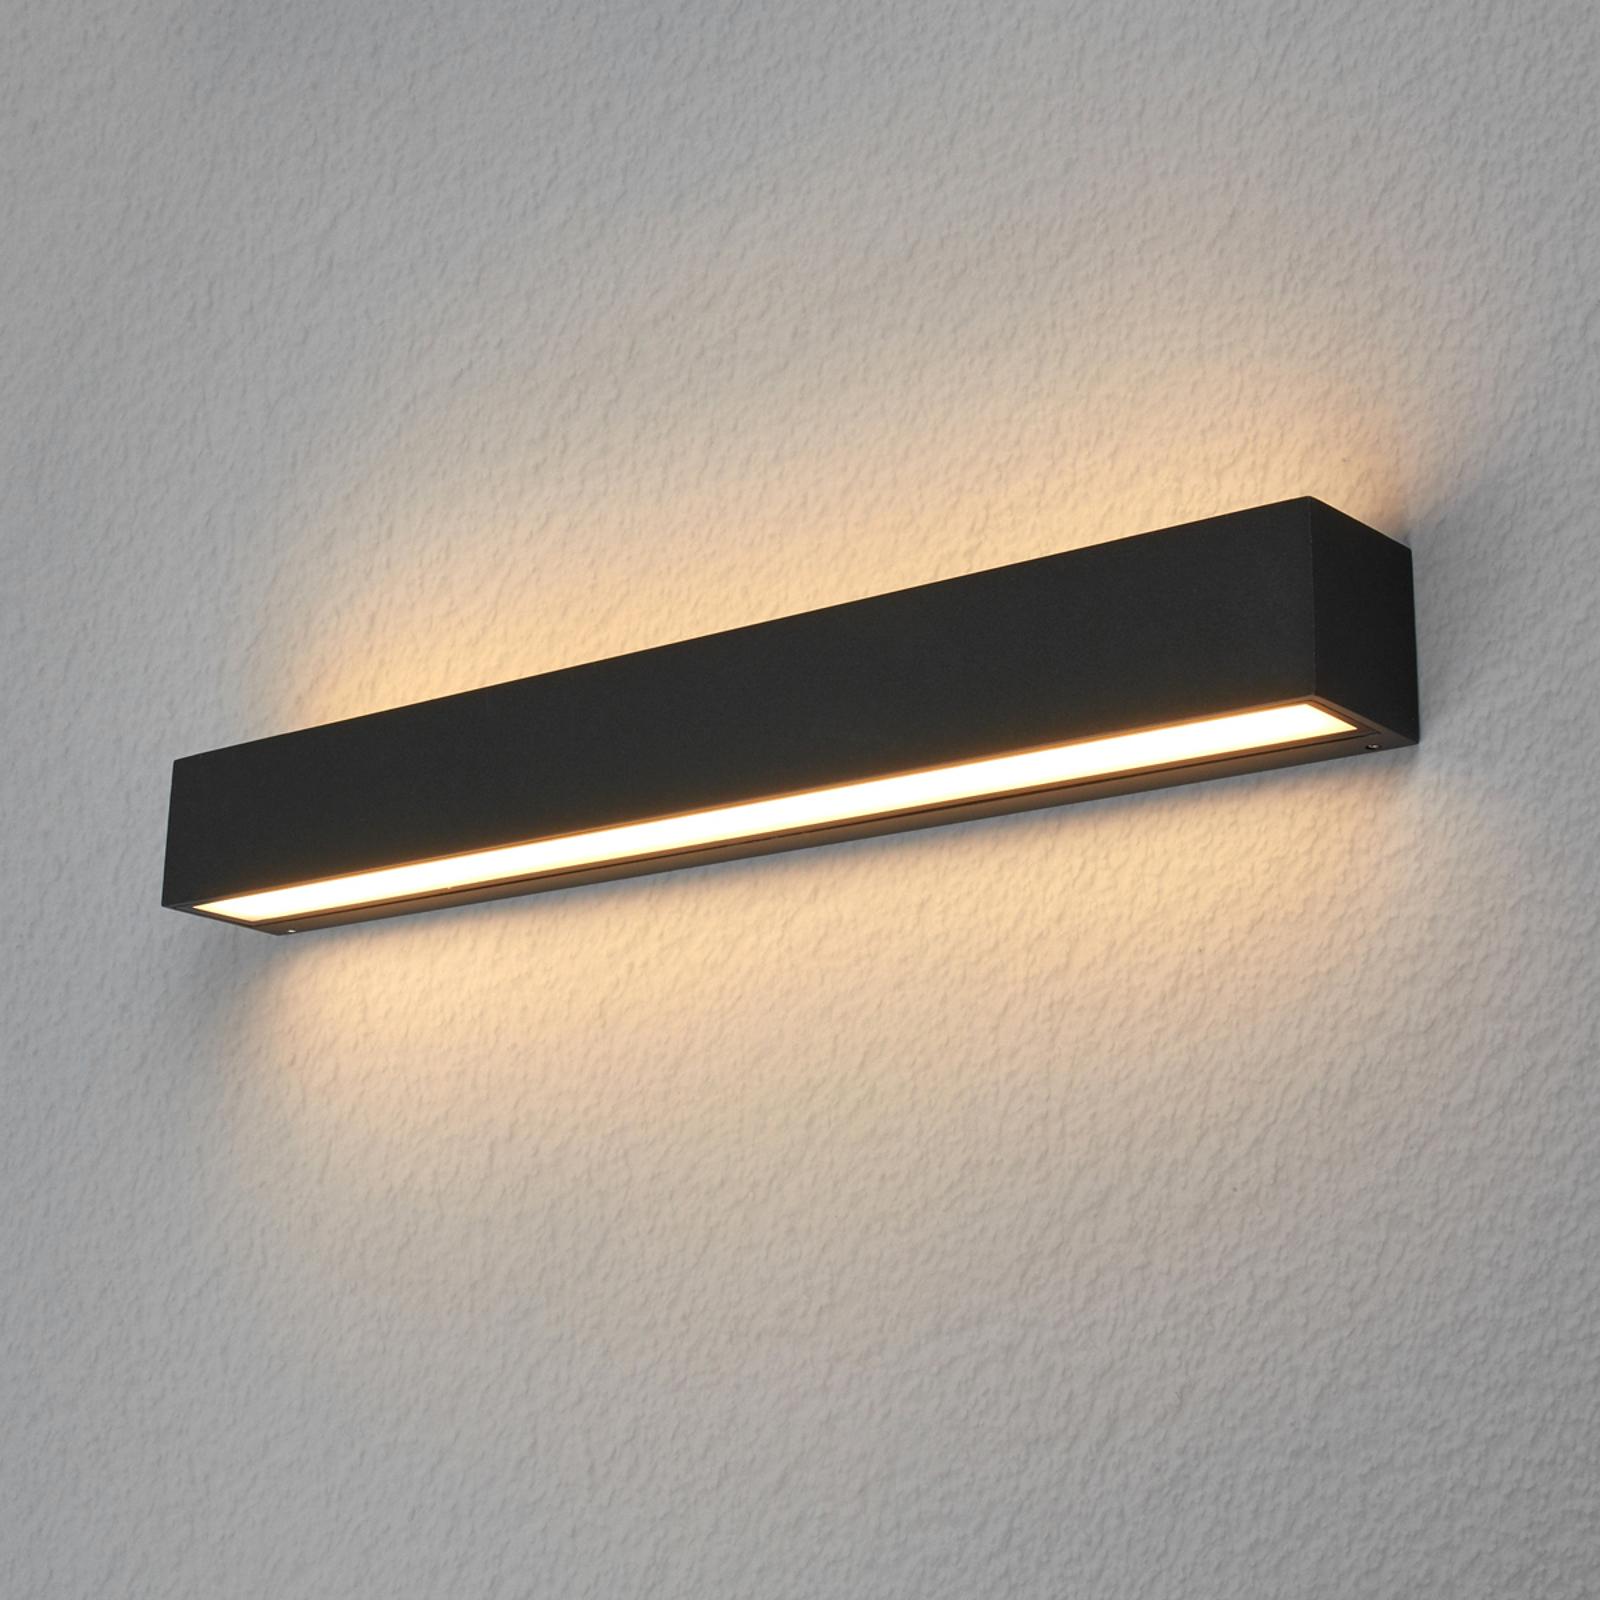 Hoekige LED-buitenwandlamp Tuana